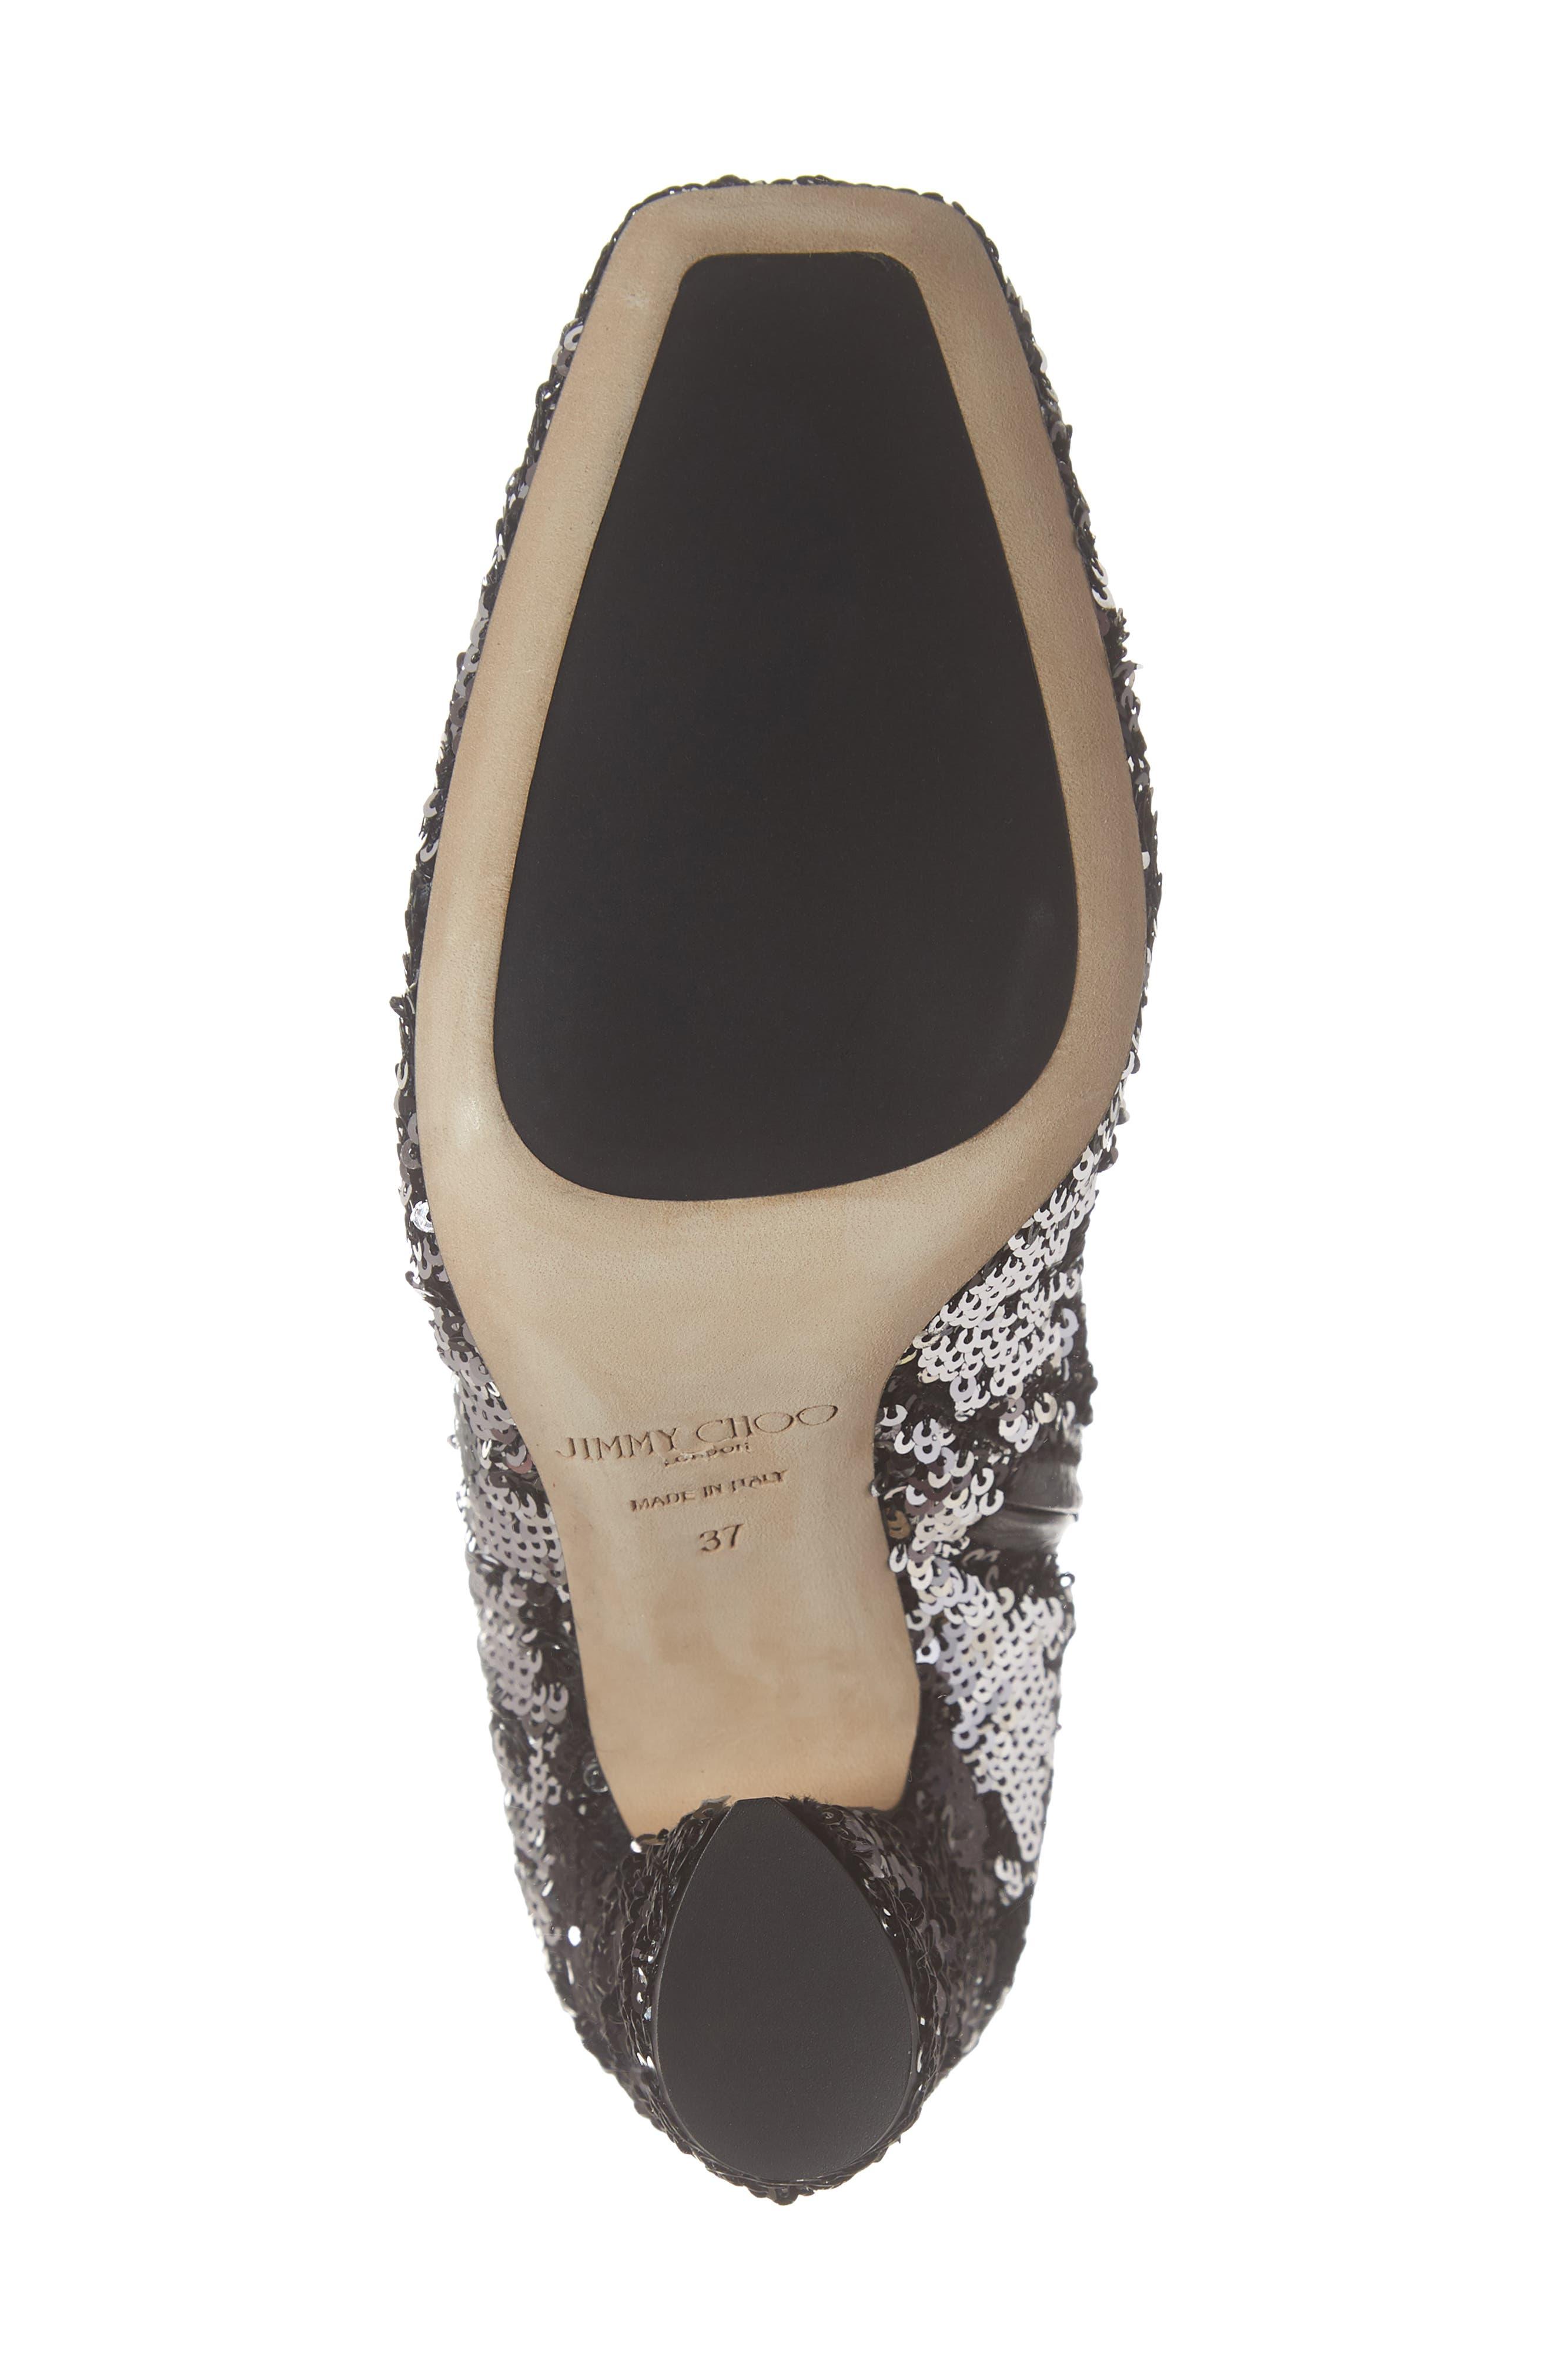 Mirren Flippable Sequin Bootie,                             Alternate thumbnail 6, color,                             BLACK/ SILVER